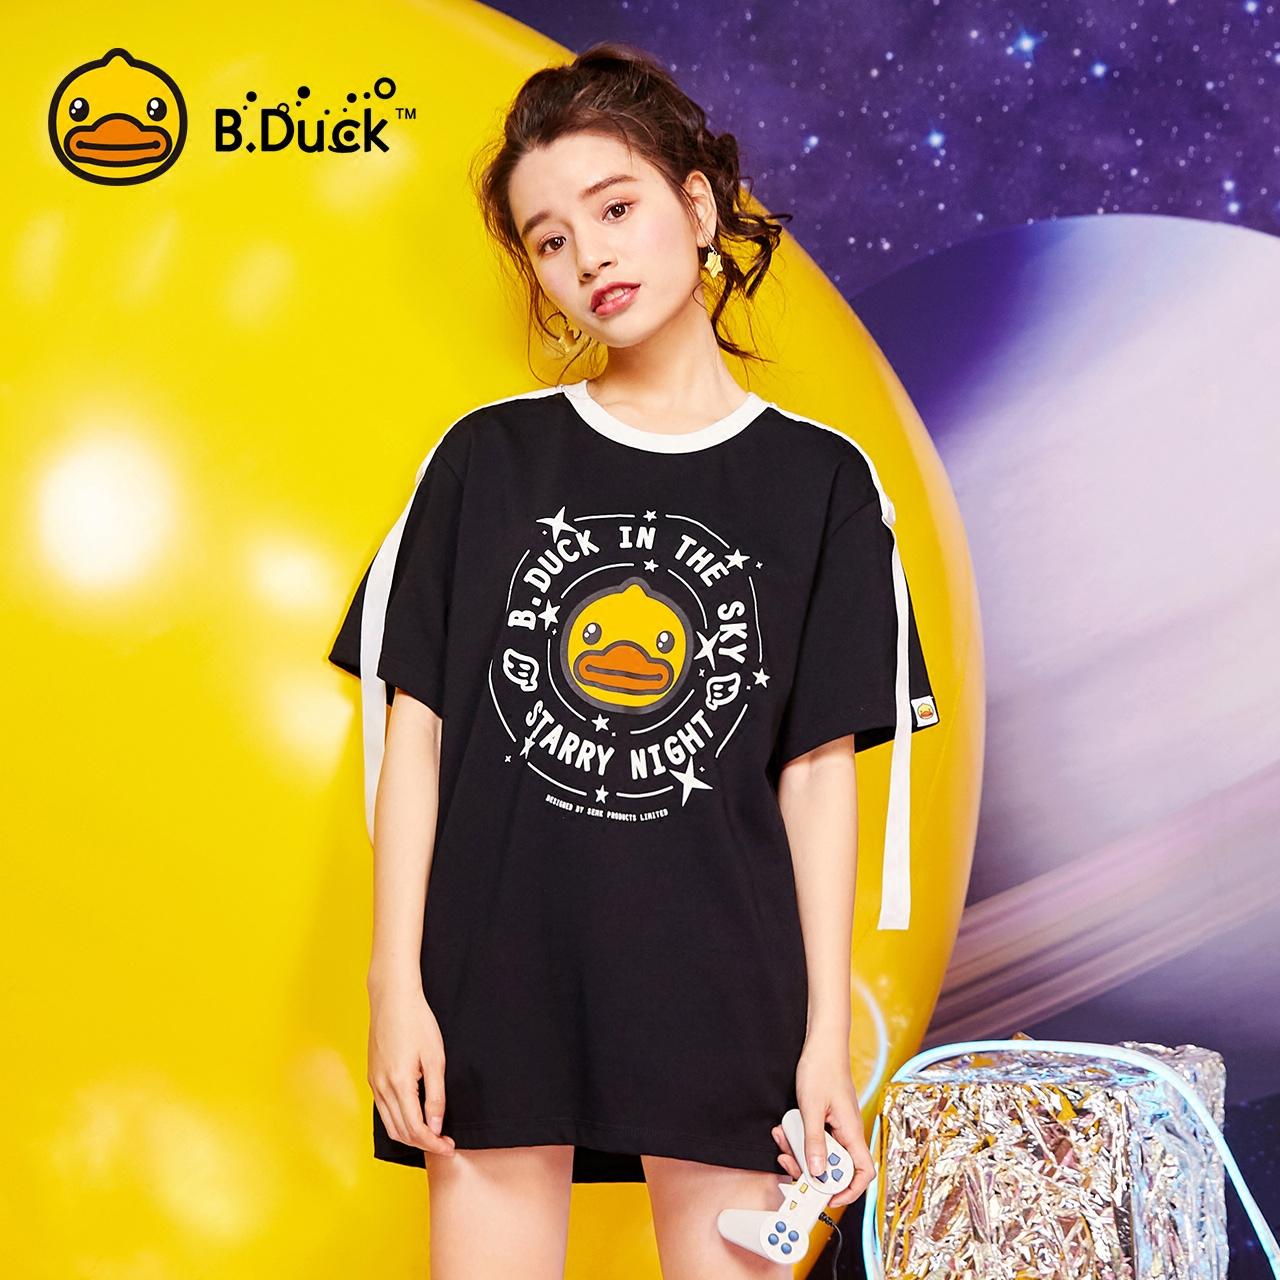 B.DuckCOSMO小黄鸭女装2018夏新款织带宽松印花短袖T恤纯棉上衣